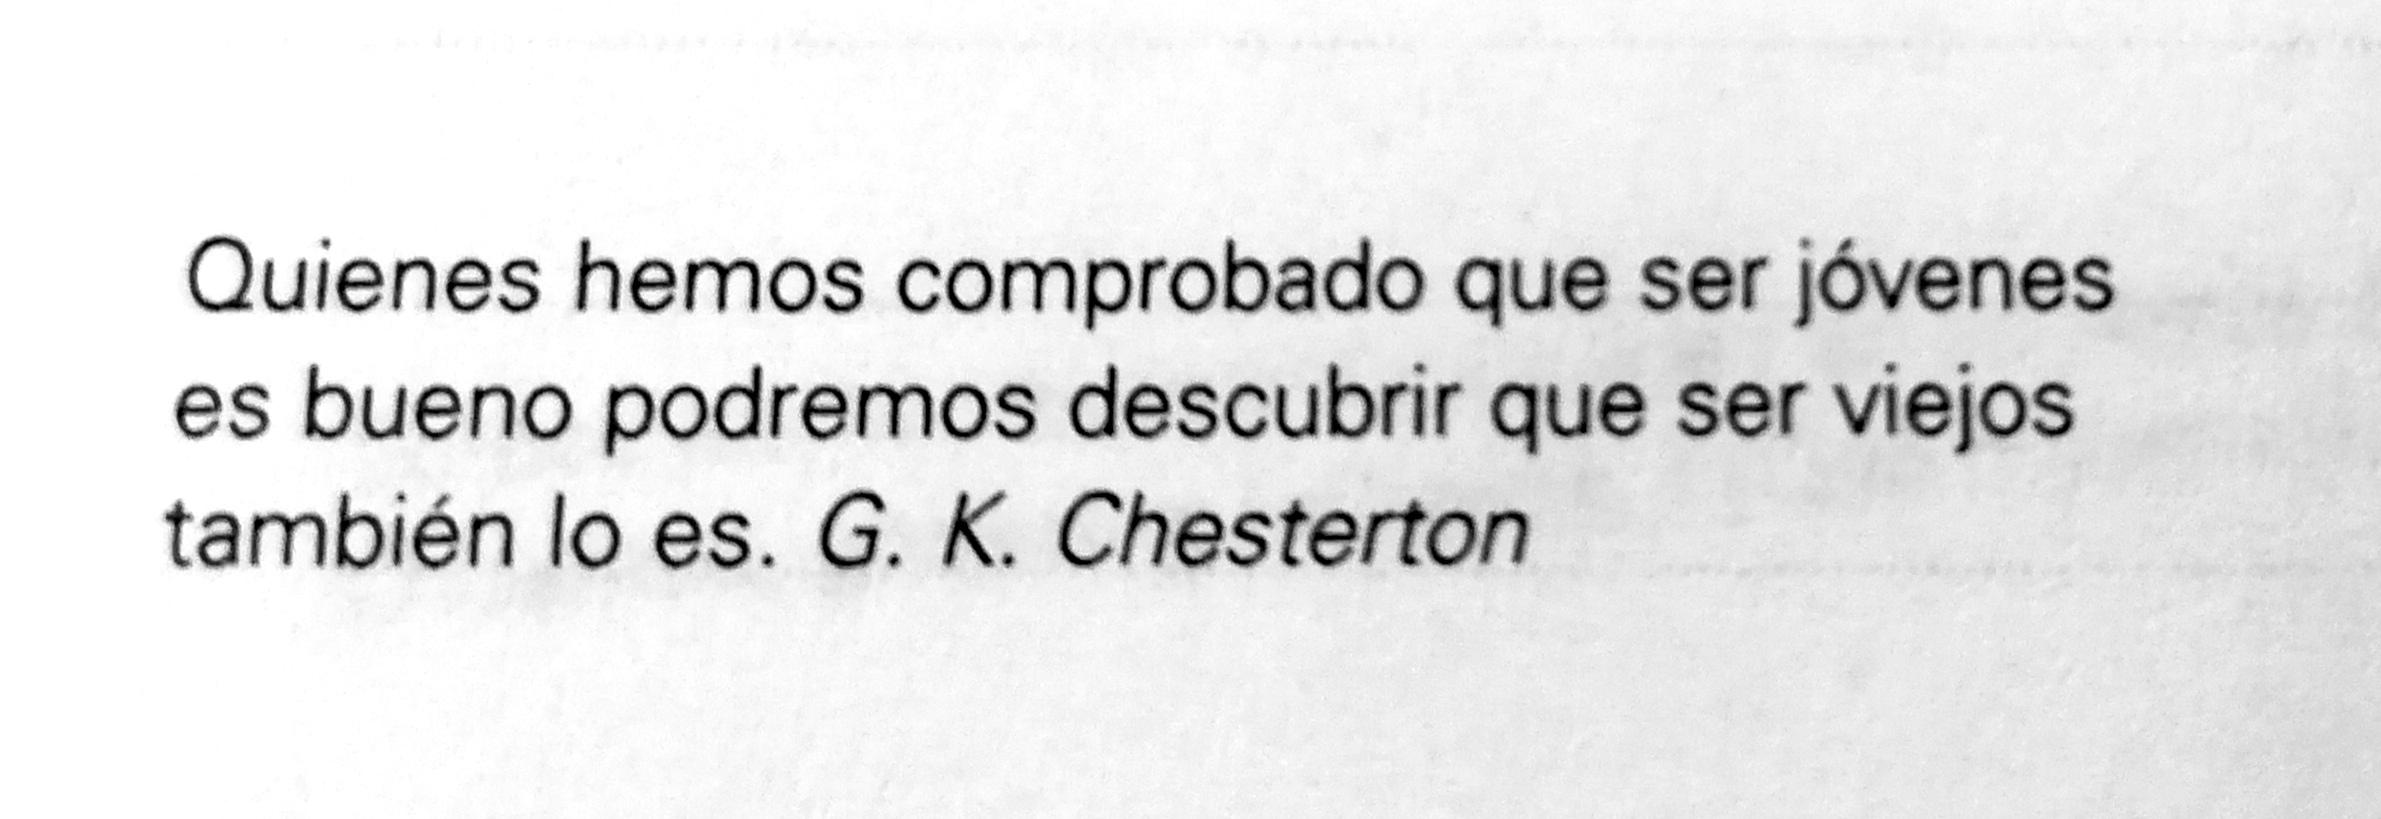 Frase de G. K. Chesterton